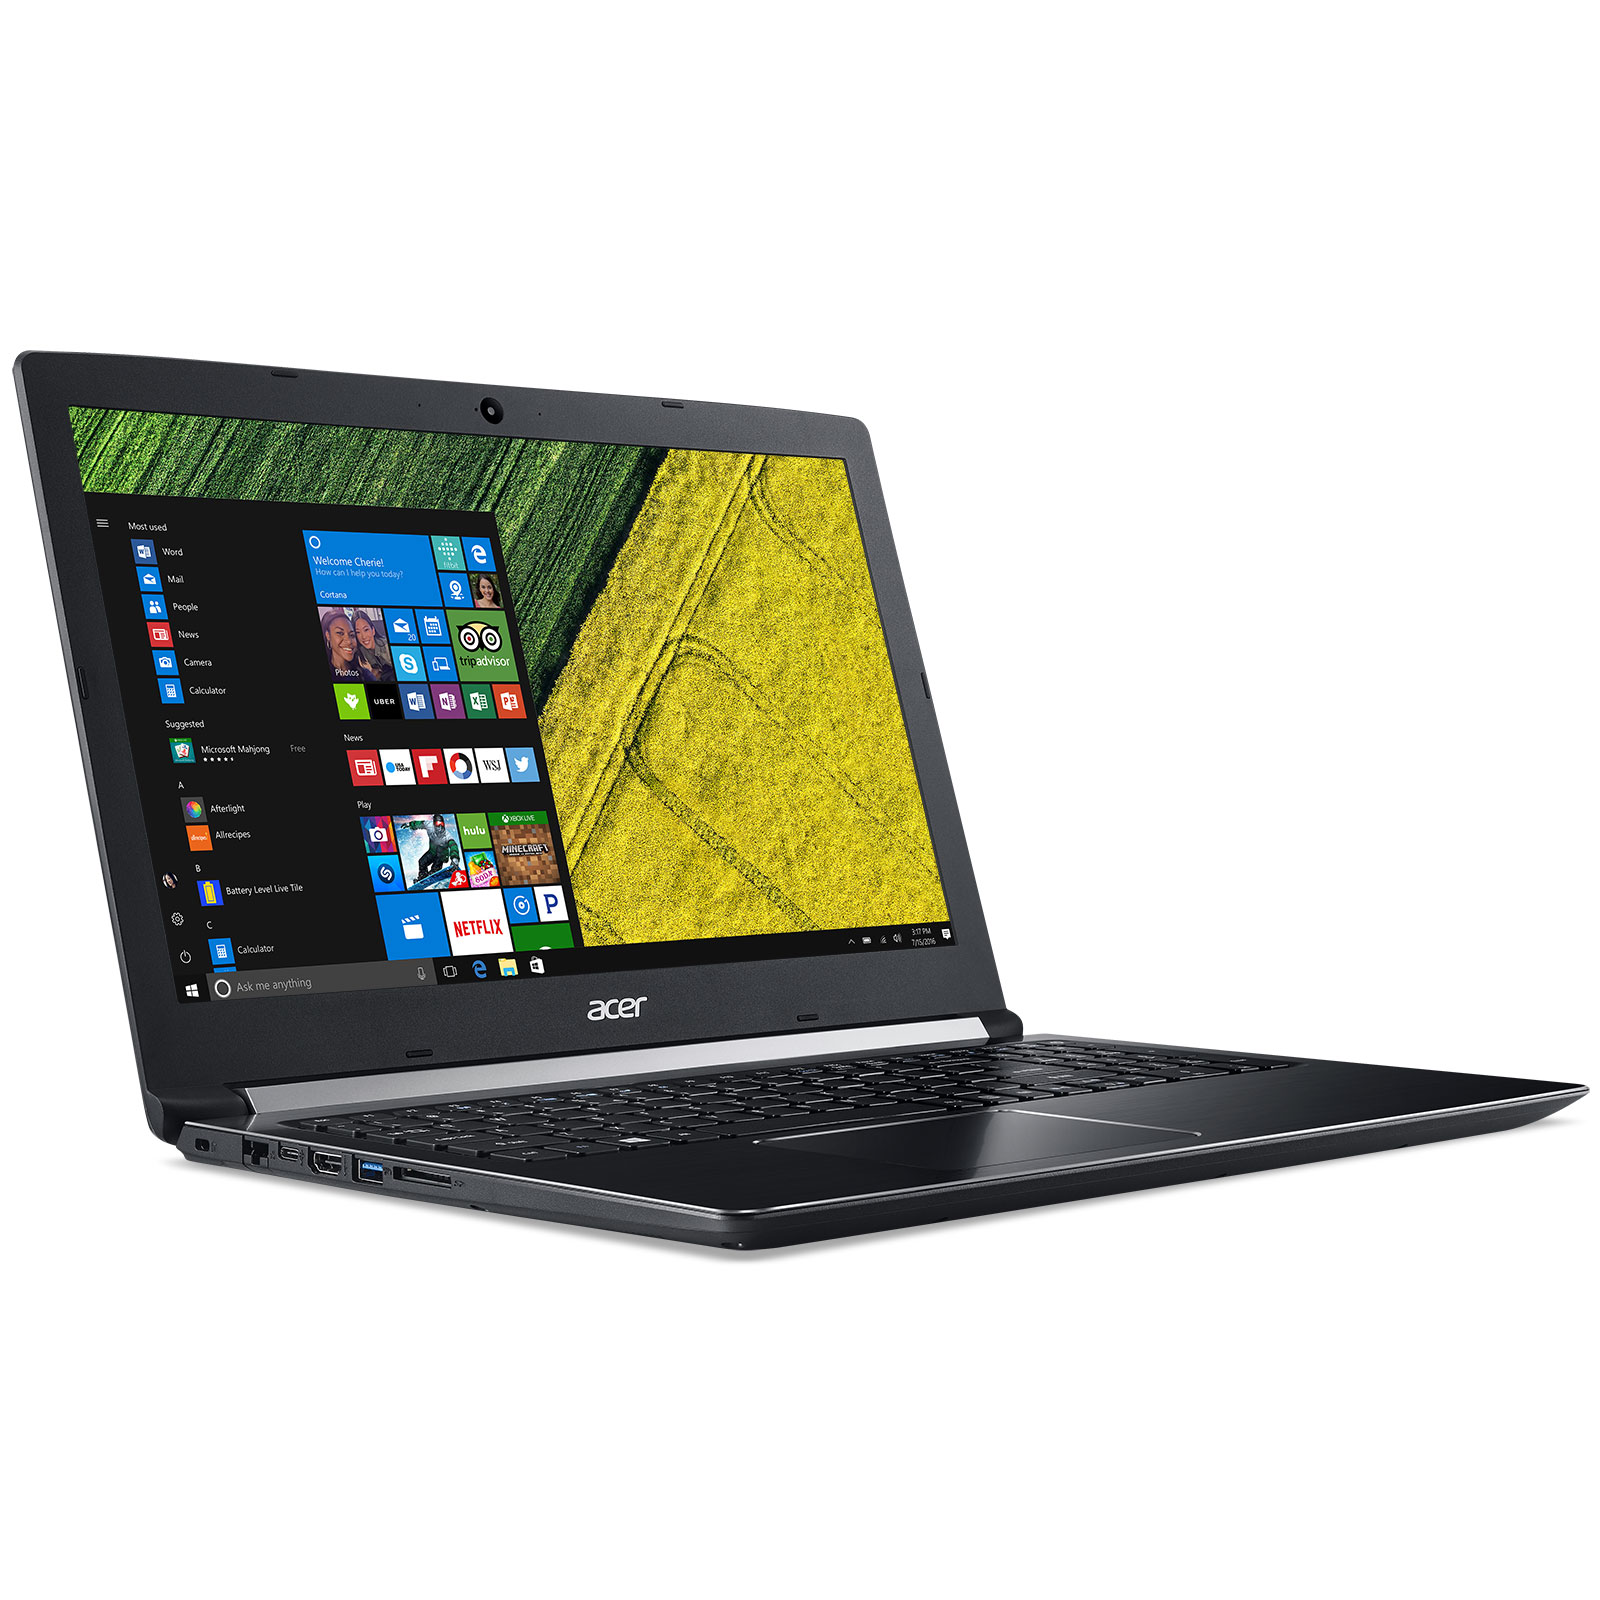 "PC portable Acer Aspire 5 A515-51-39Q4 Intel Core i3-8130U 4 Go SSD 128 Go 15.6"" LED Full HD Wi-Fi AC/Bluetooth Webcam Windows 10 Famille 64 bits"